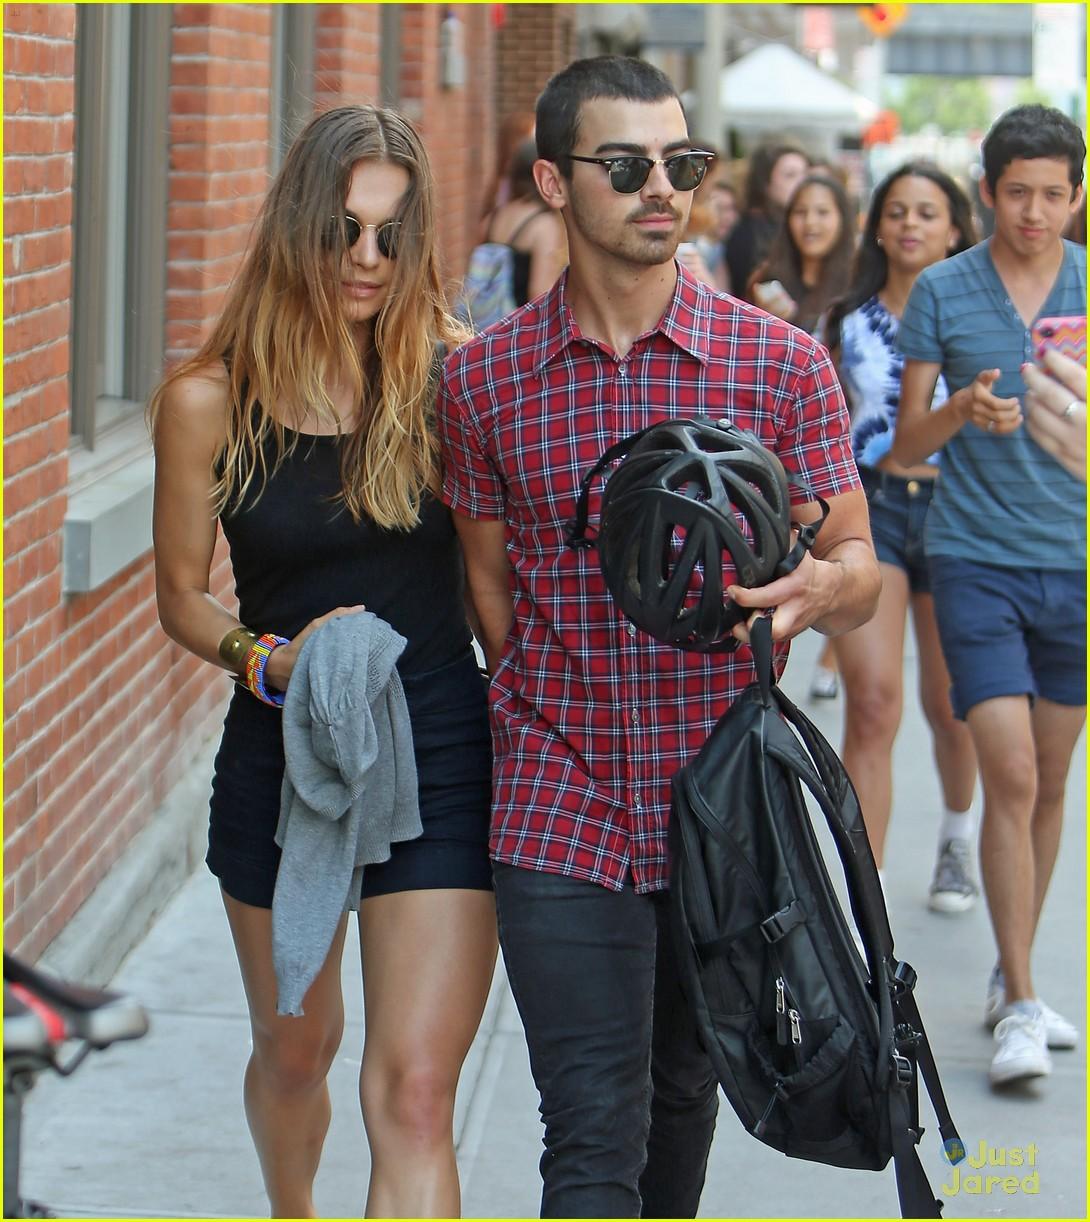 Joe Jonas & Blanda Eggenschwiler: Meatpacking District ... | 1090 x 1222 jpeg 328kB